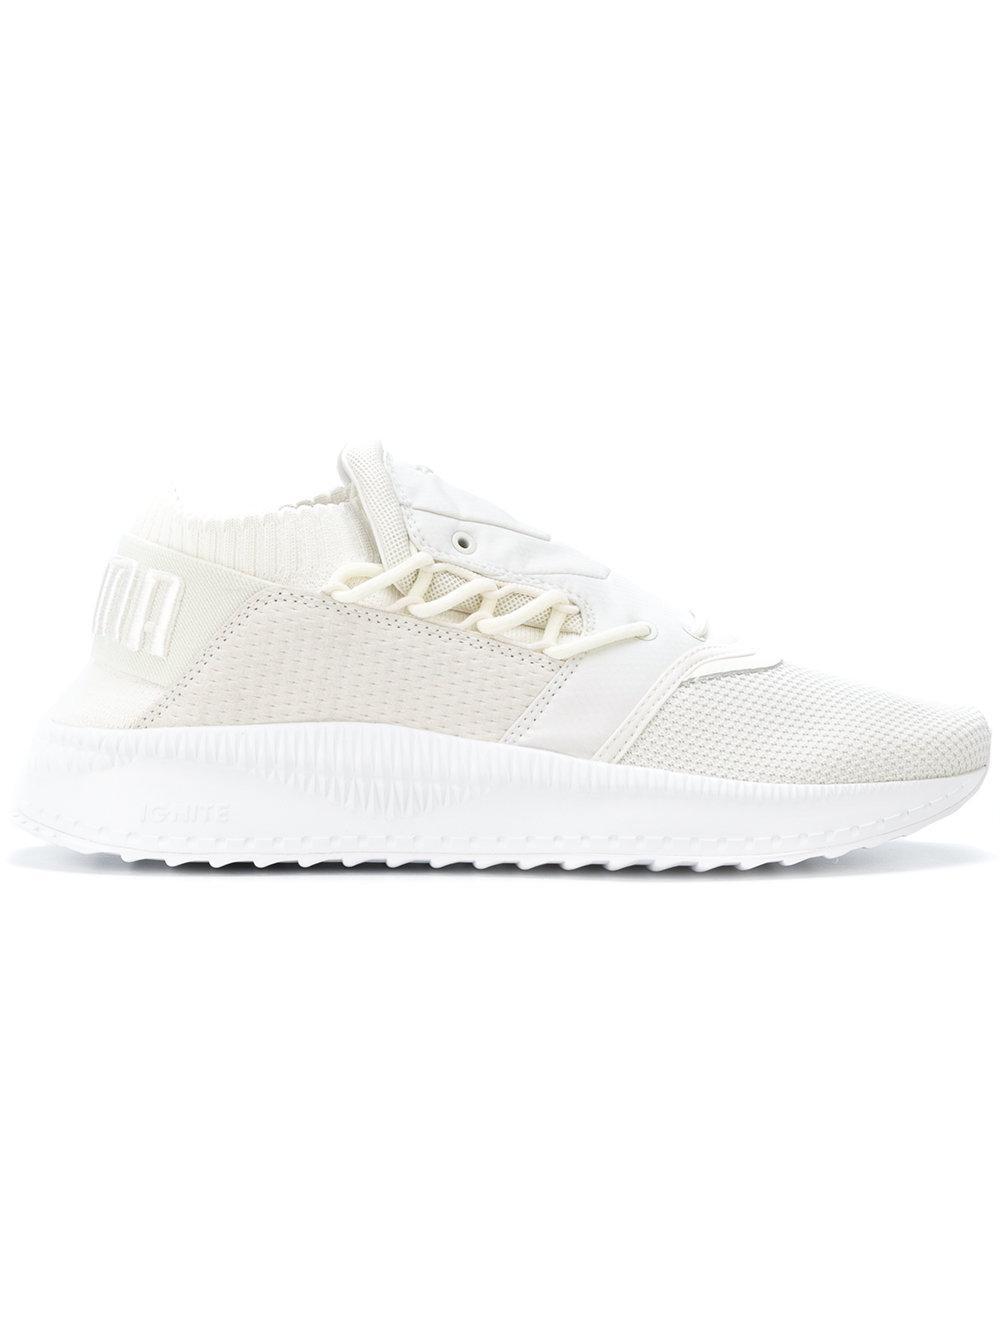 47636053ab4 Lyst - Puma Tsugi Shinsei Raw Sneakers in White for Men